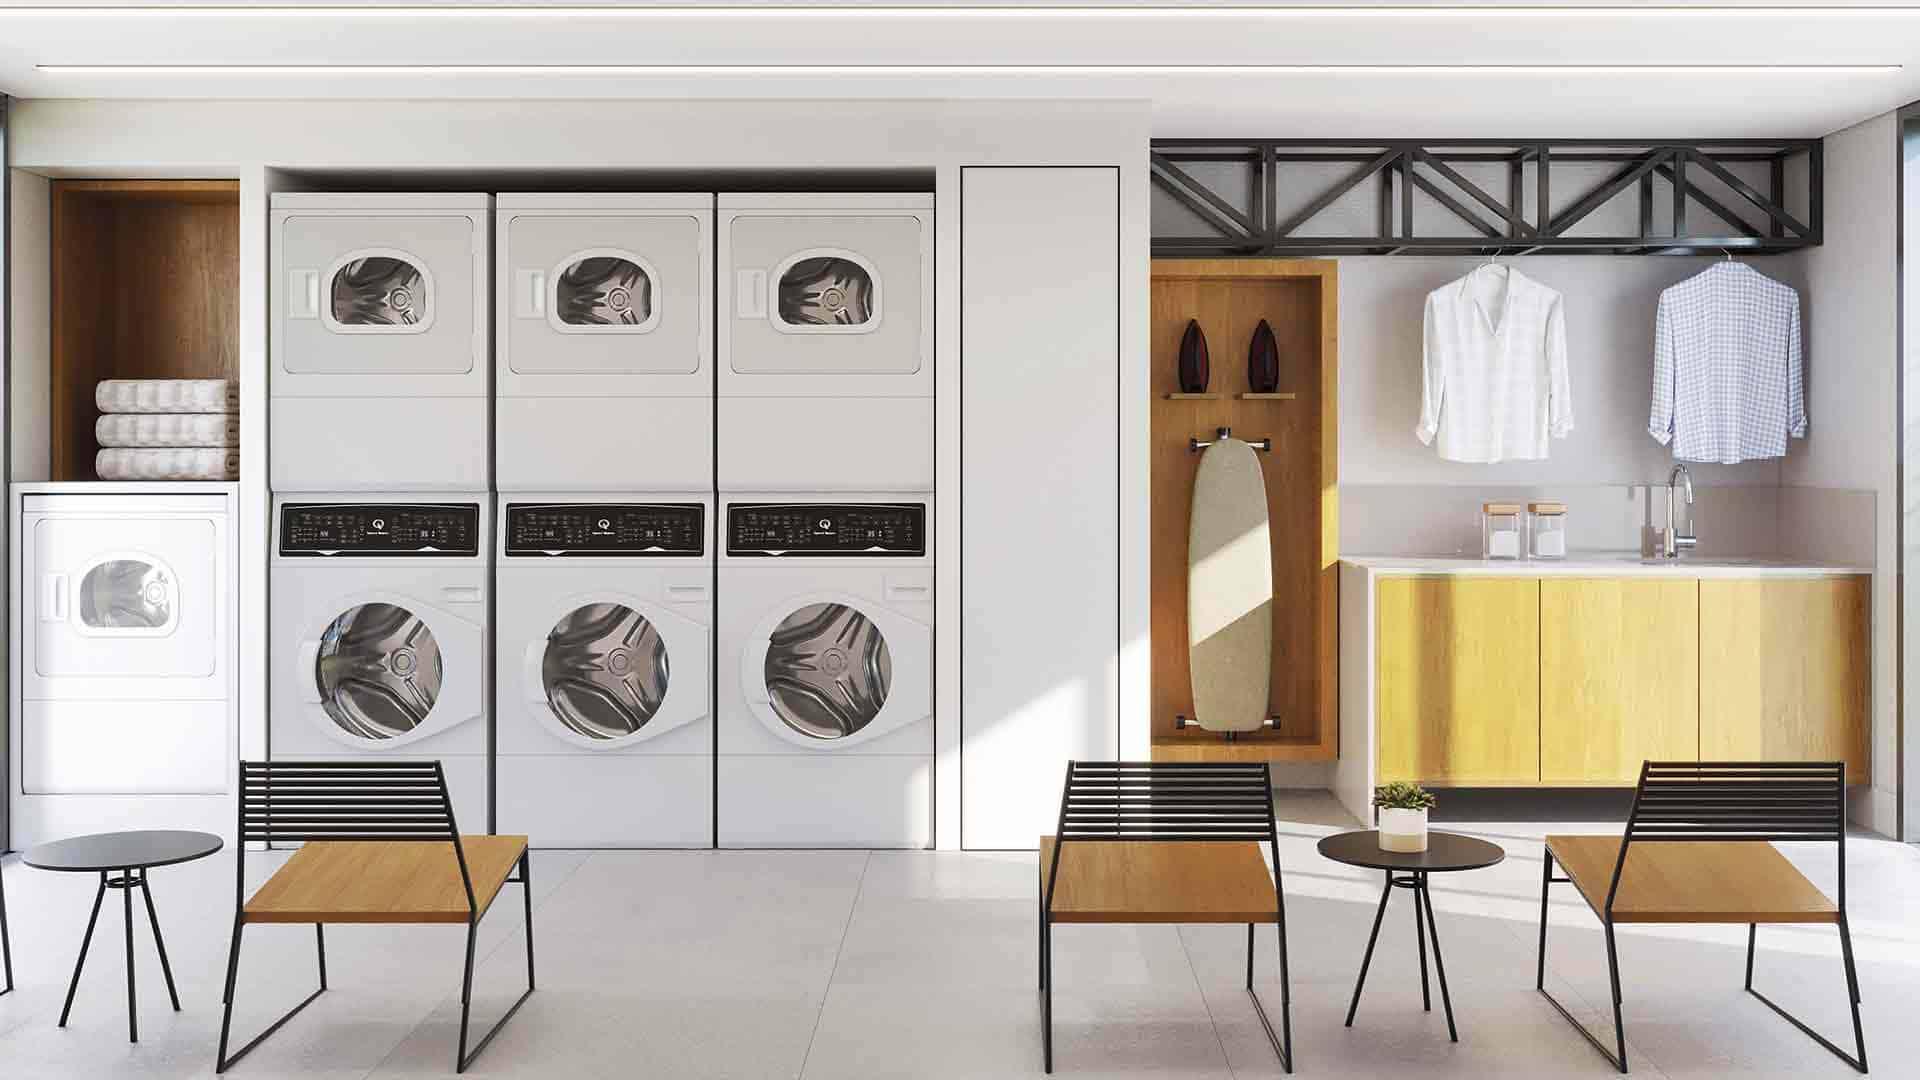 Perspectiva artística da lavanderia coletiva.